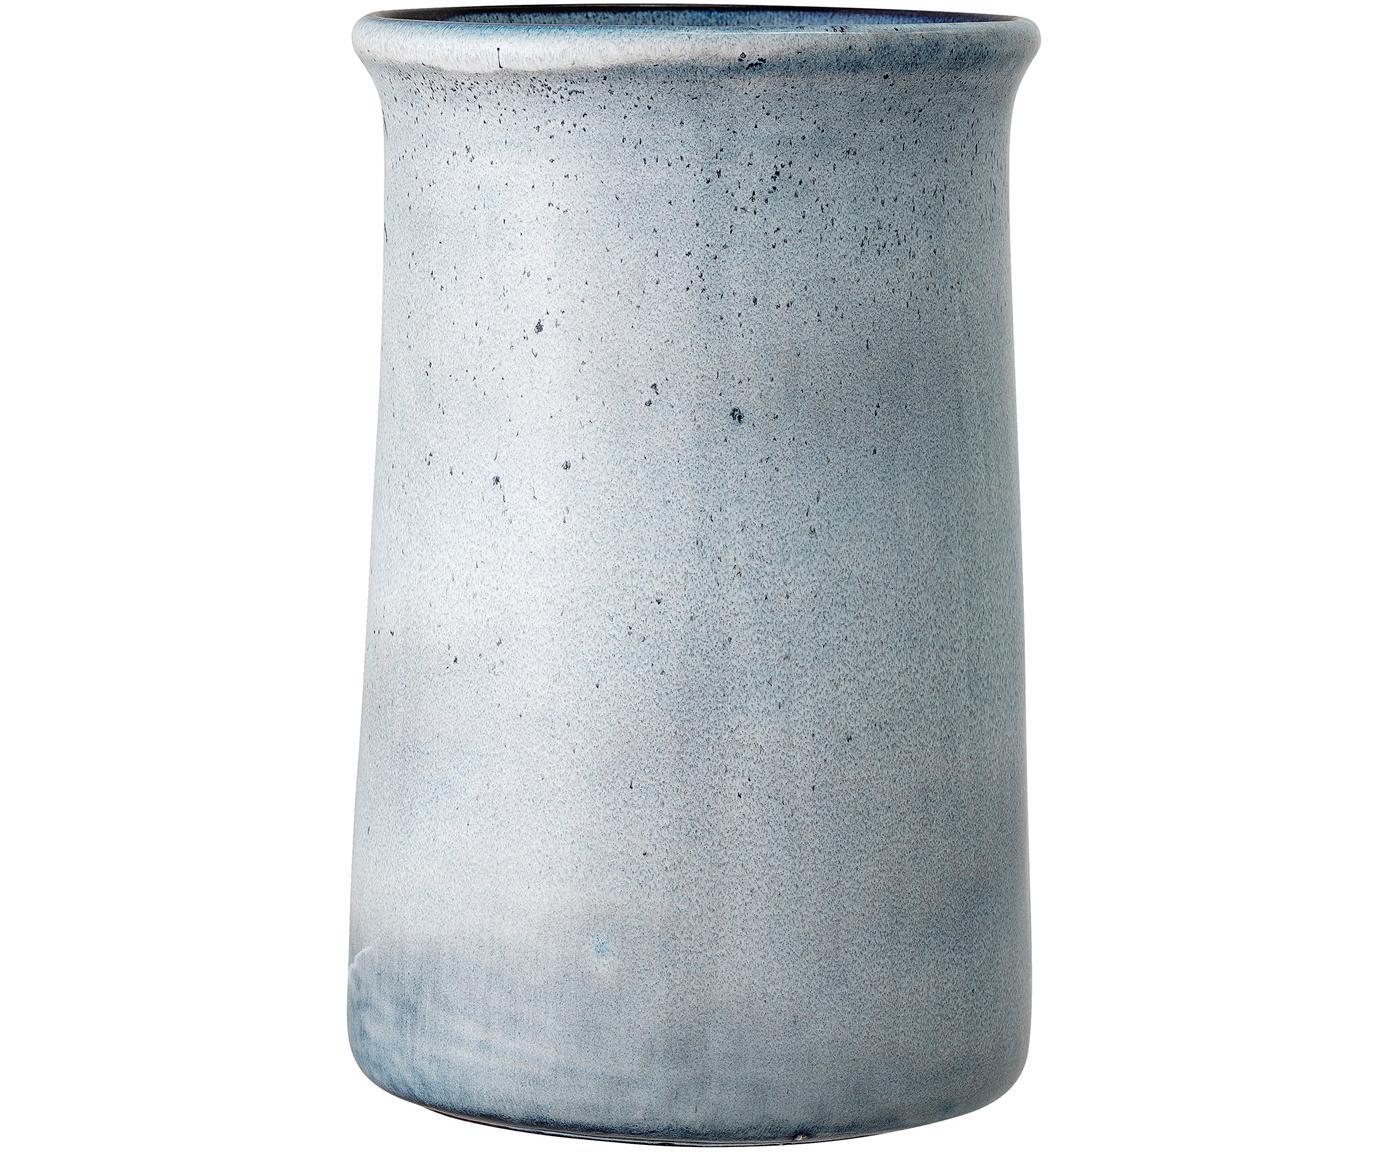 Cubitera Sandrine, Gres, Azul, Ø 15 x Al 23 cm